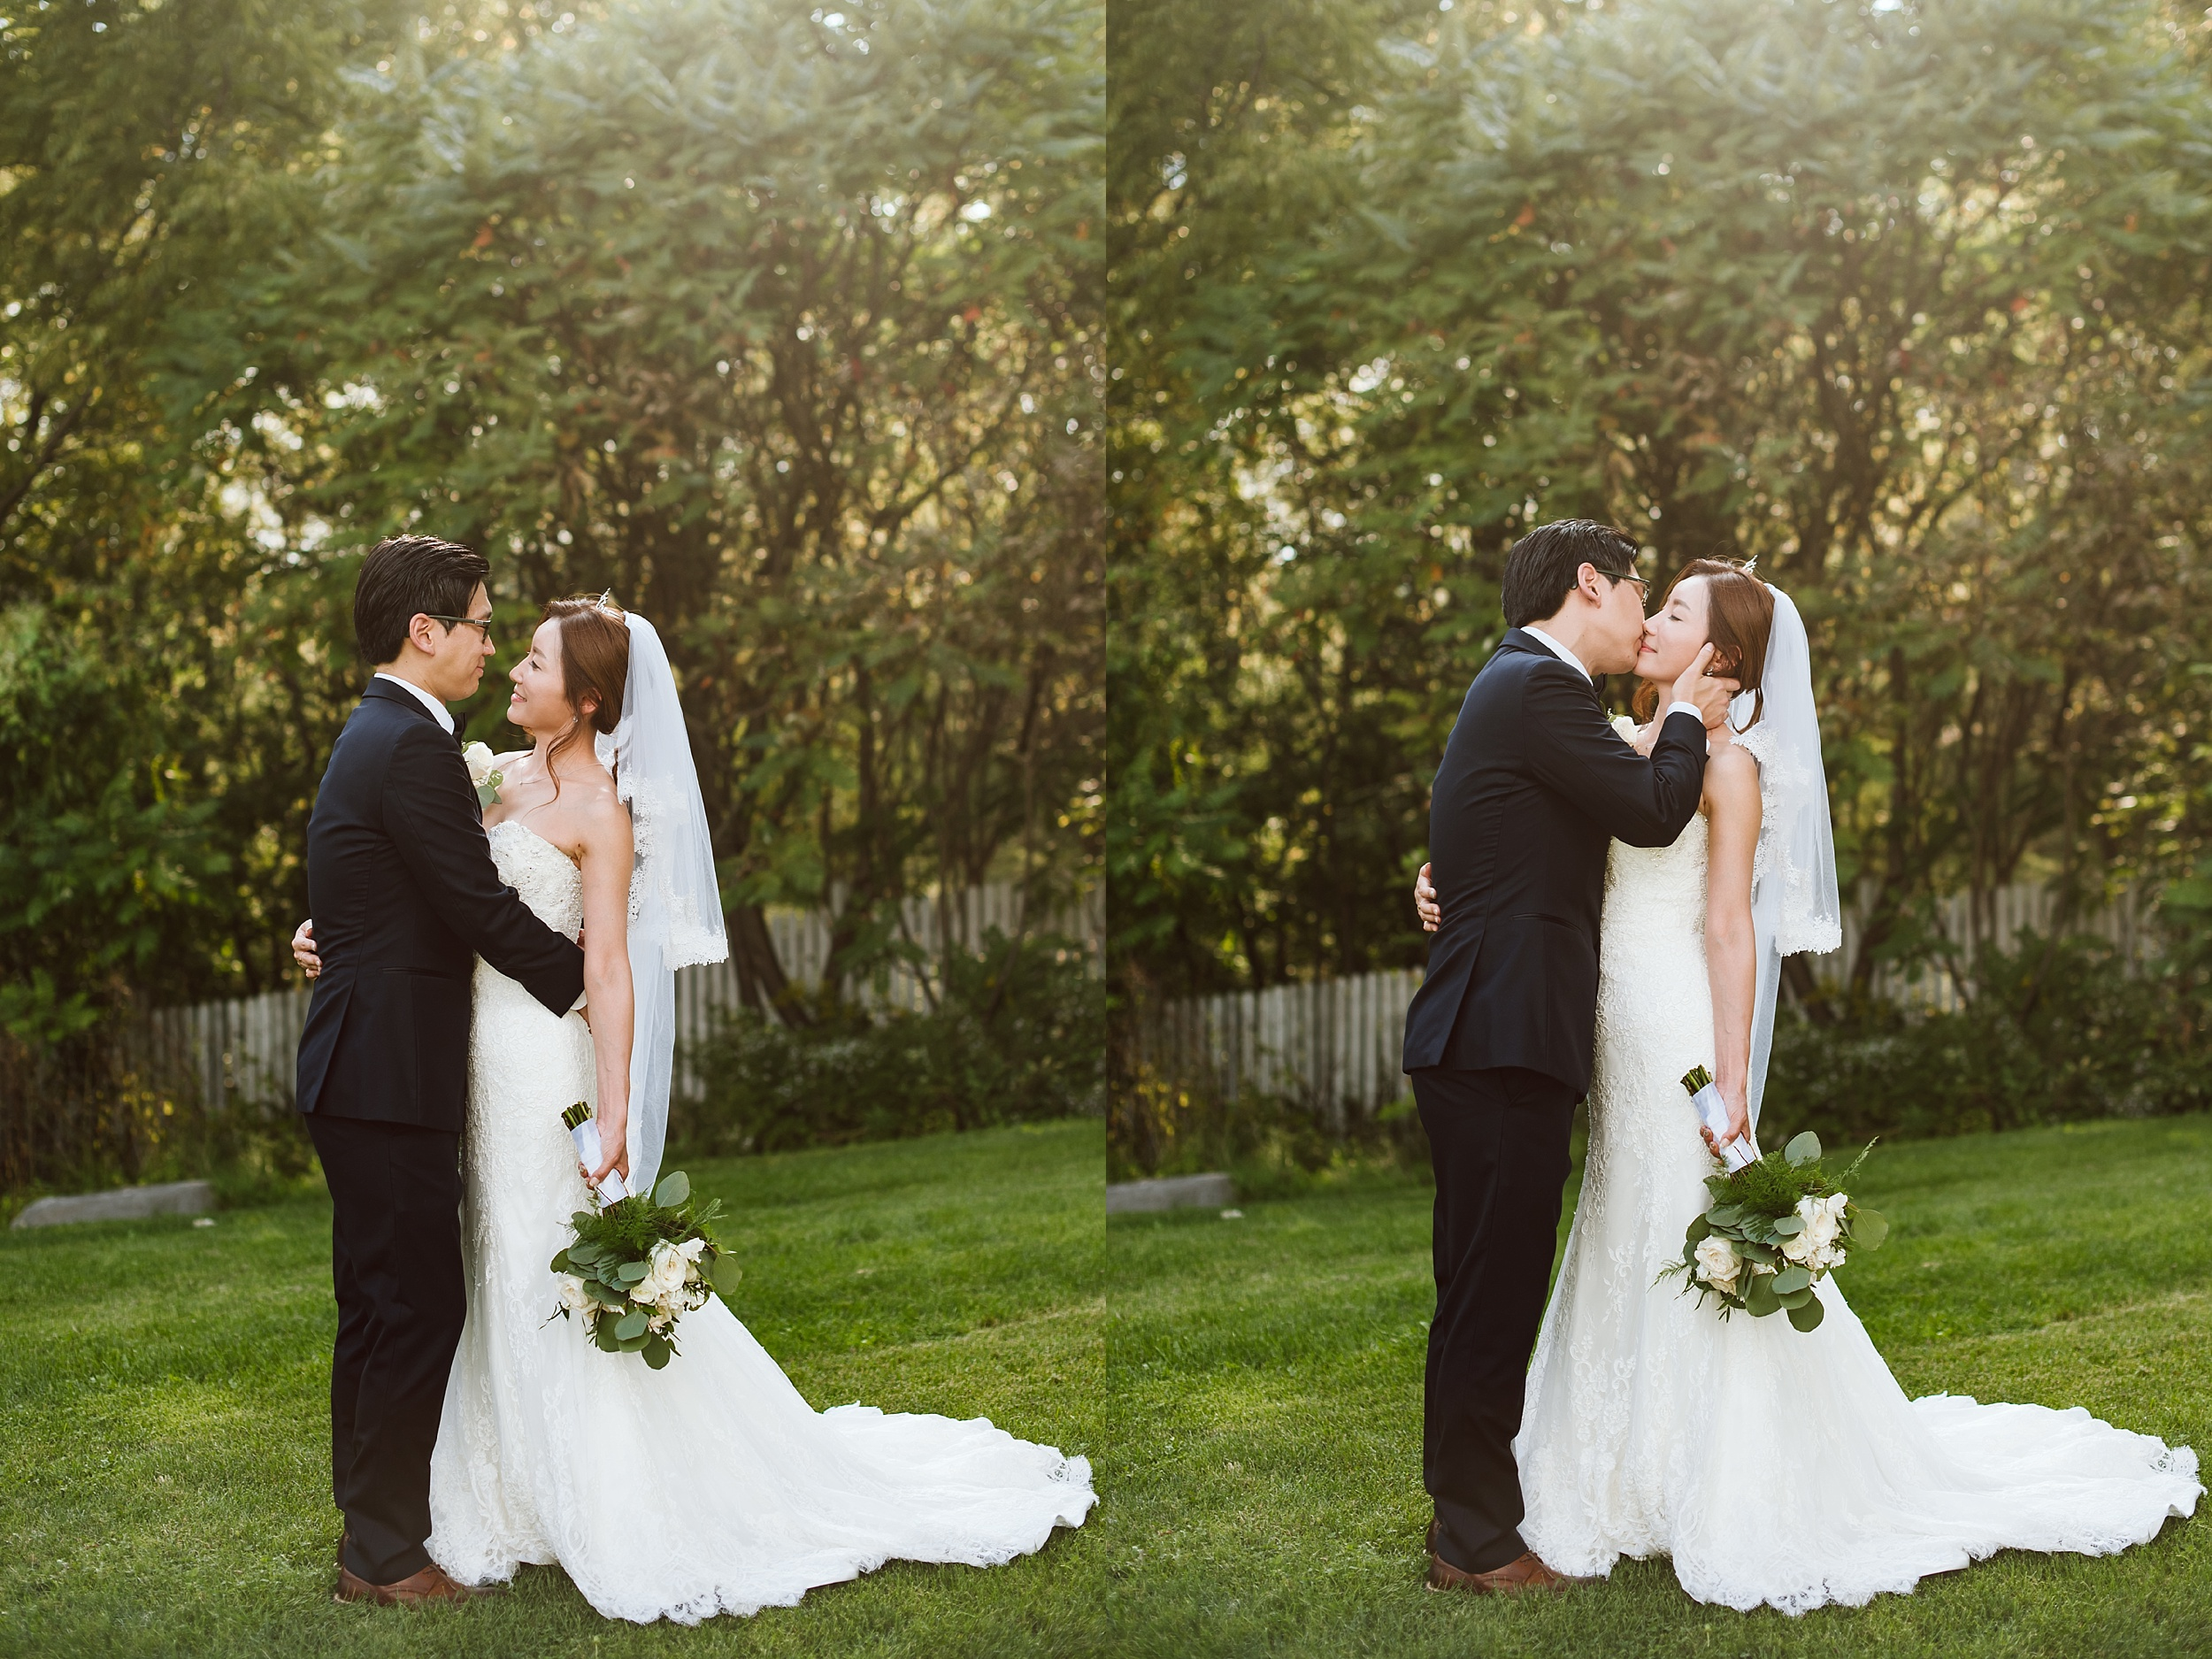 Doctors_House_Kleinburg_Wedding_Toronto_Photographer_0035.jpg